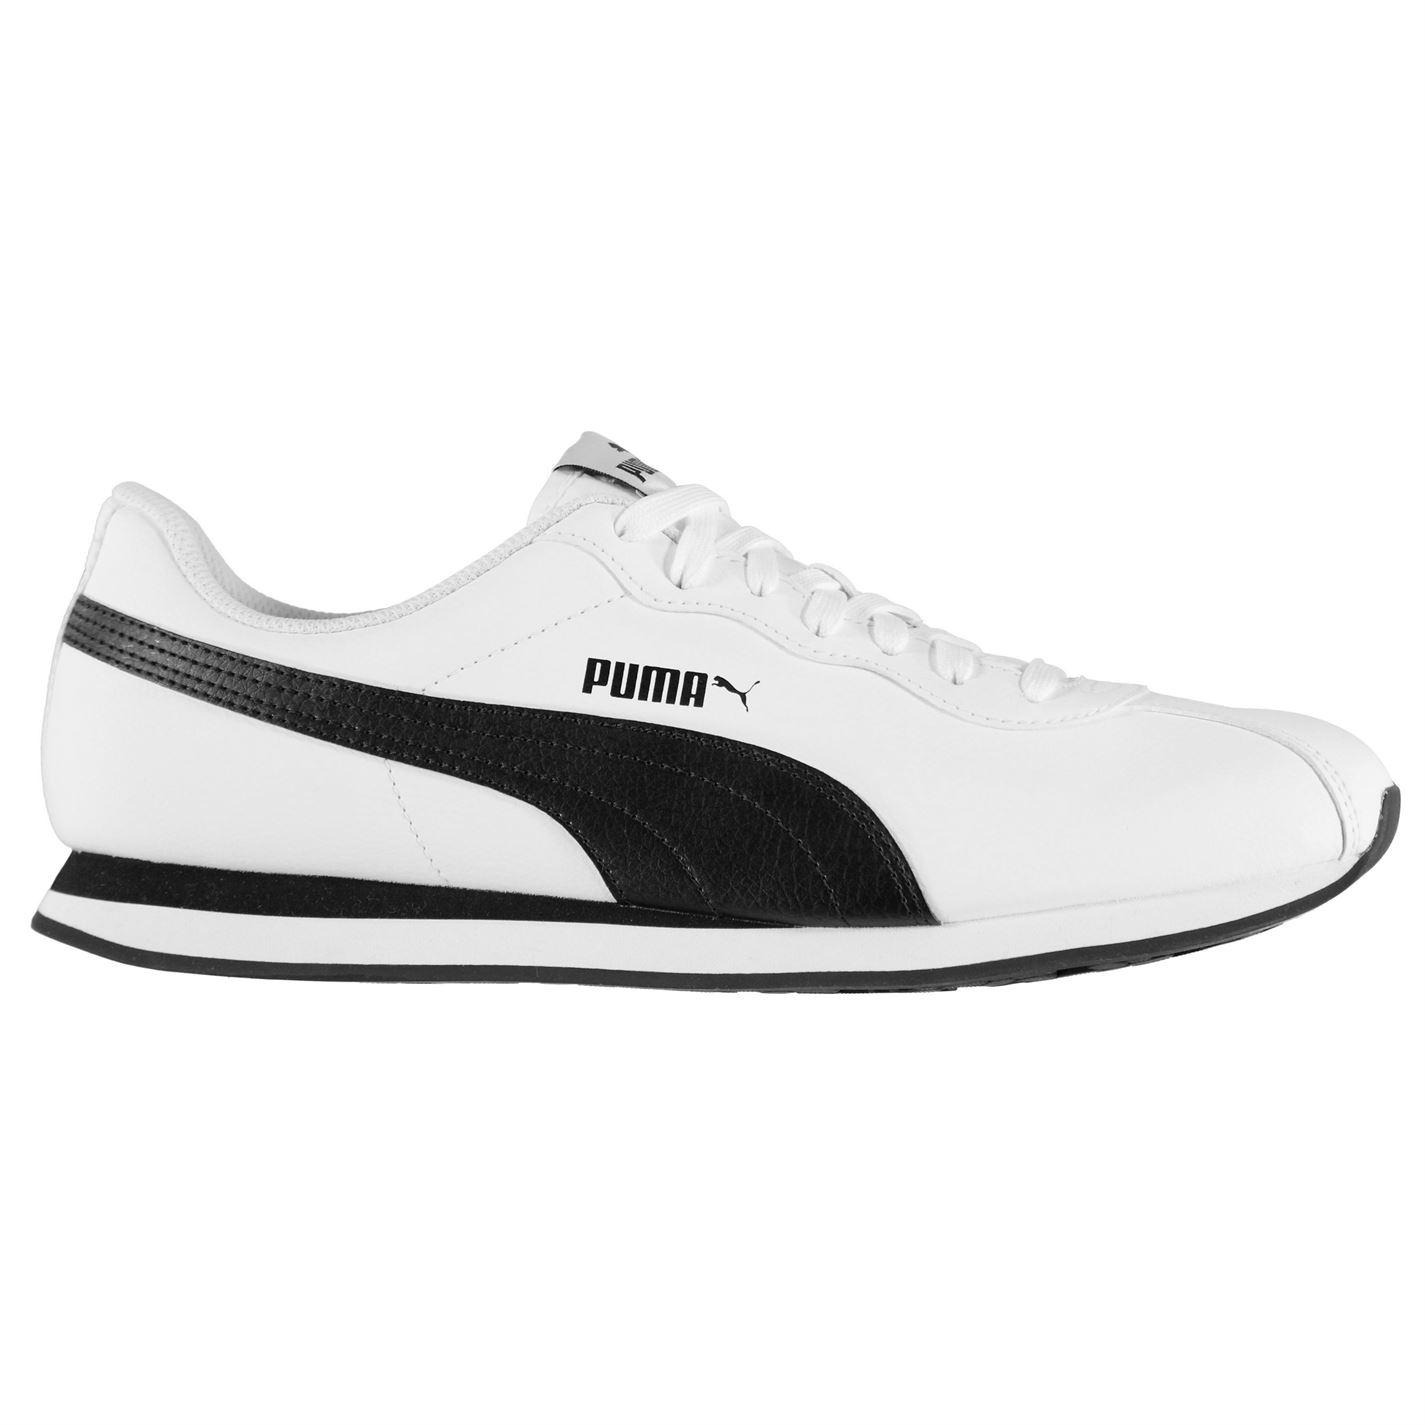 91330b47b5 boty Puma Turin II SnC00 White Black - Glami.cz